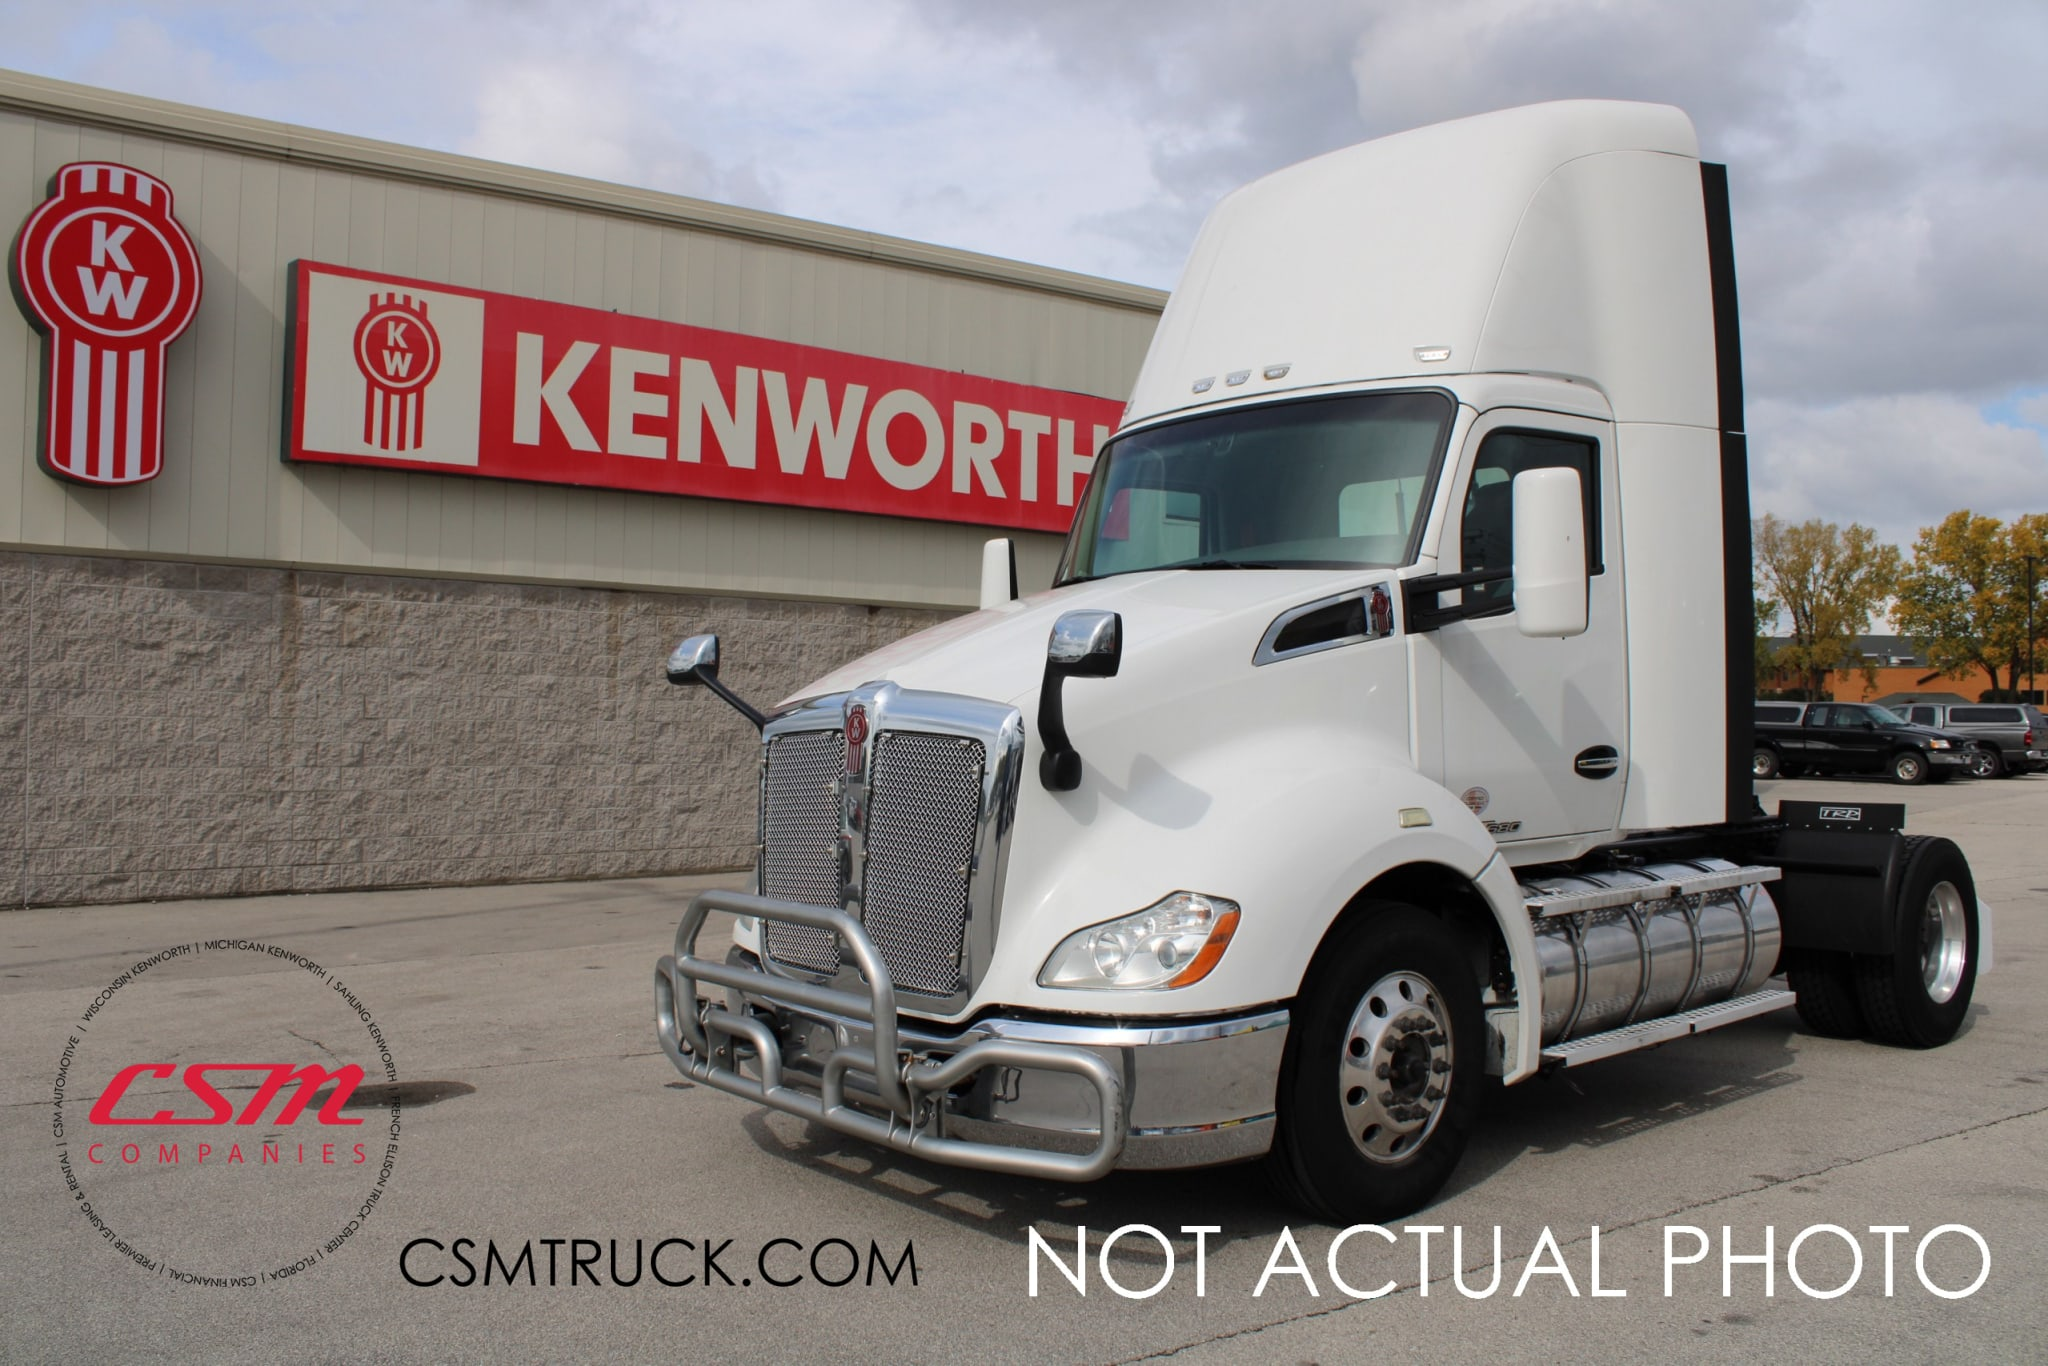 2017 Kenworth T680 UHJ163071 full